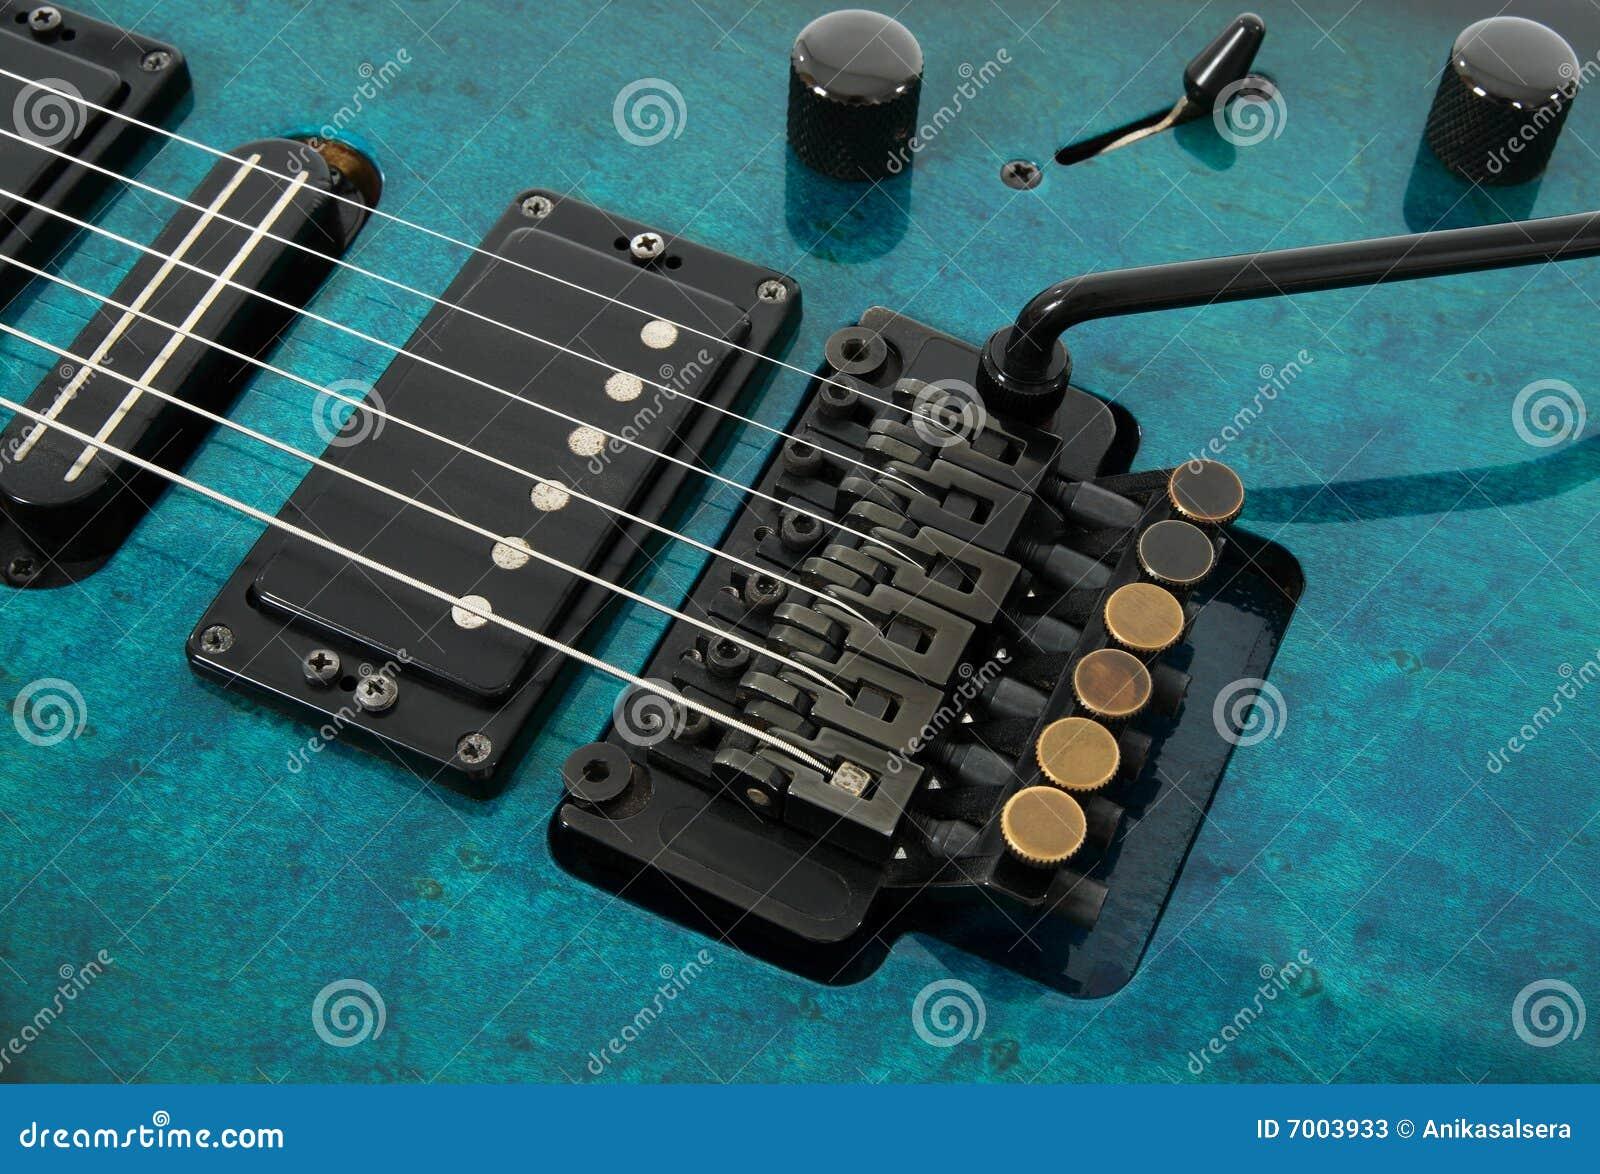 electric guitar tremolo system stock image image 7003933. Black Bedroom Furniture Sets. Home Design Ideas